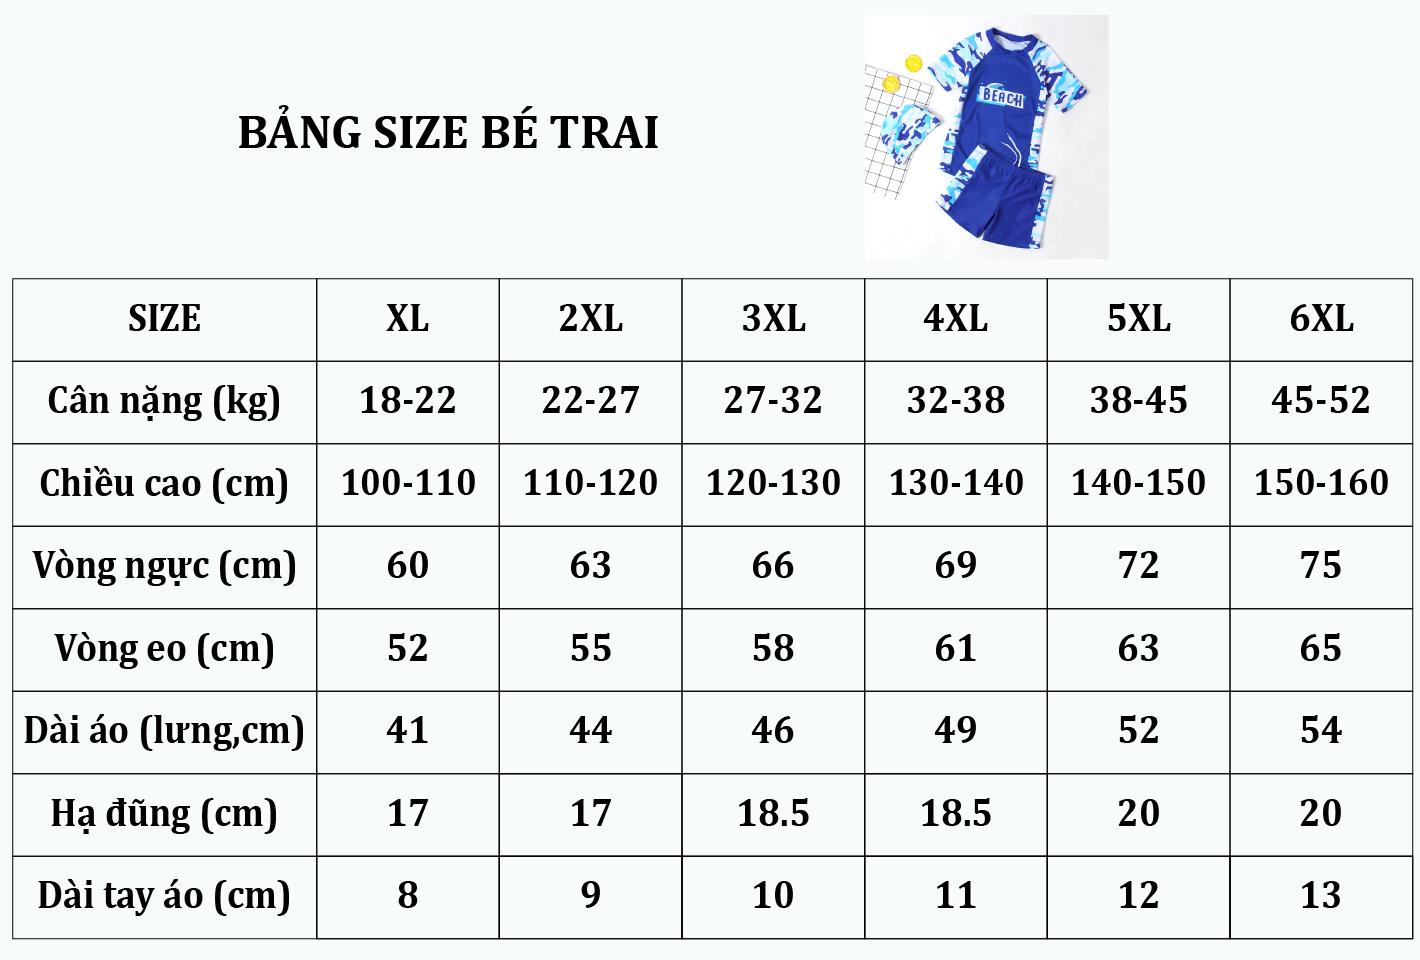 Bảng size